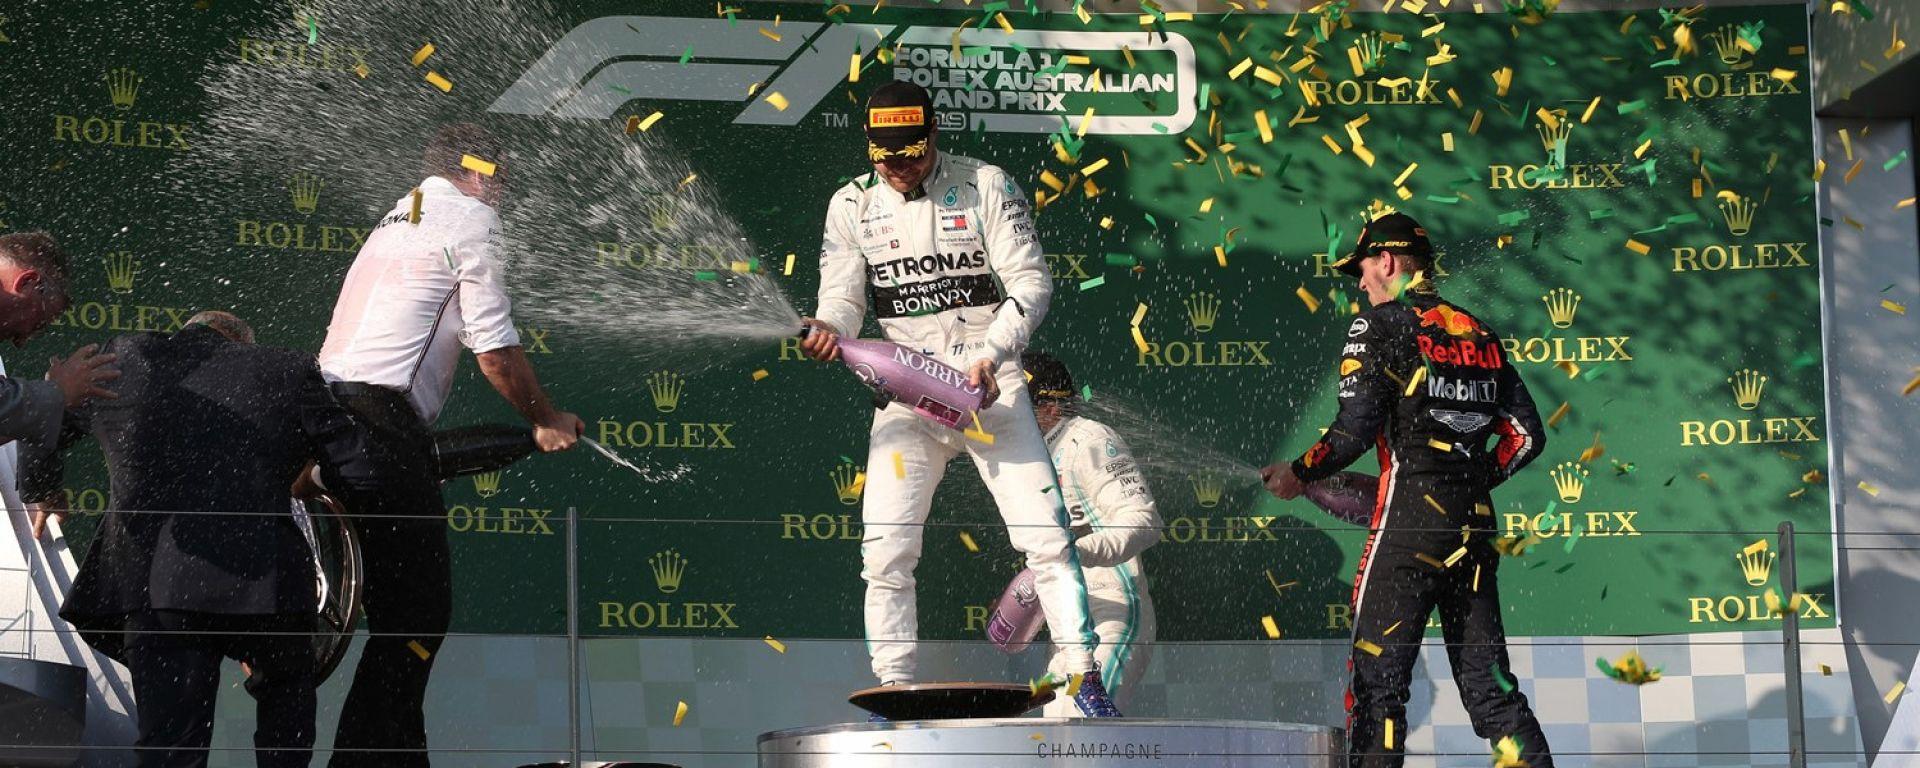 GP Australia 2019 - Bottas e Verstappen festeggiano sul podio